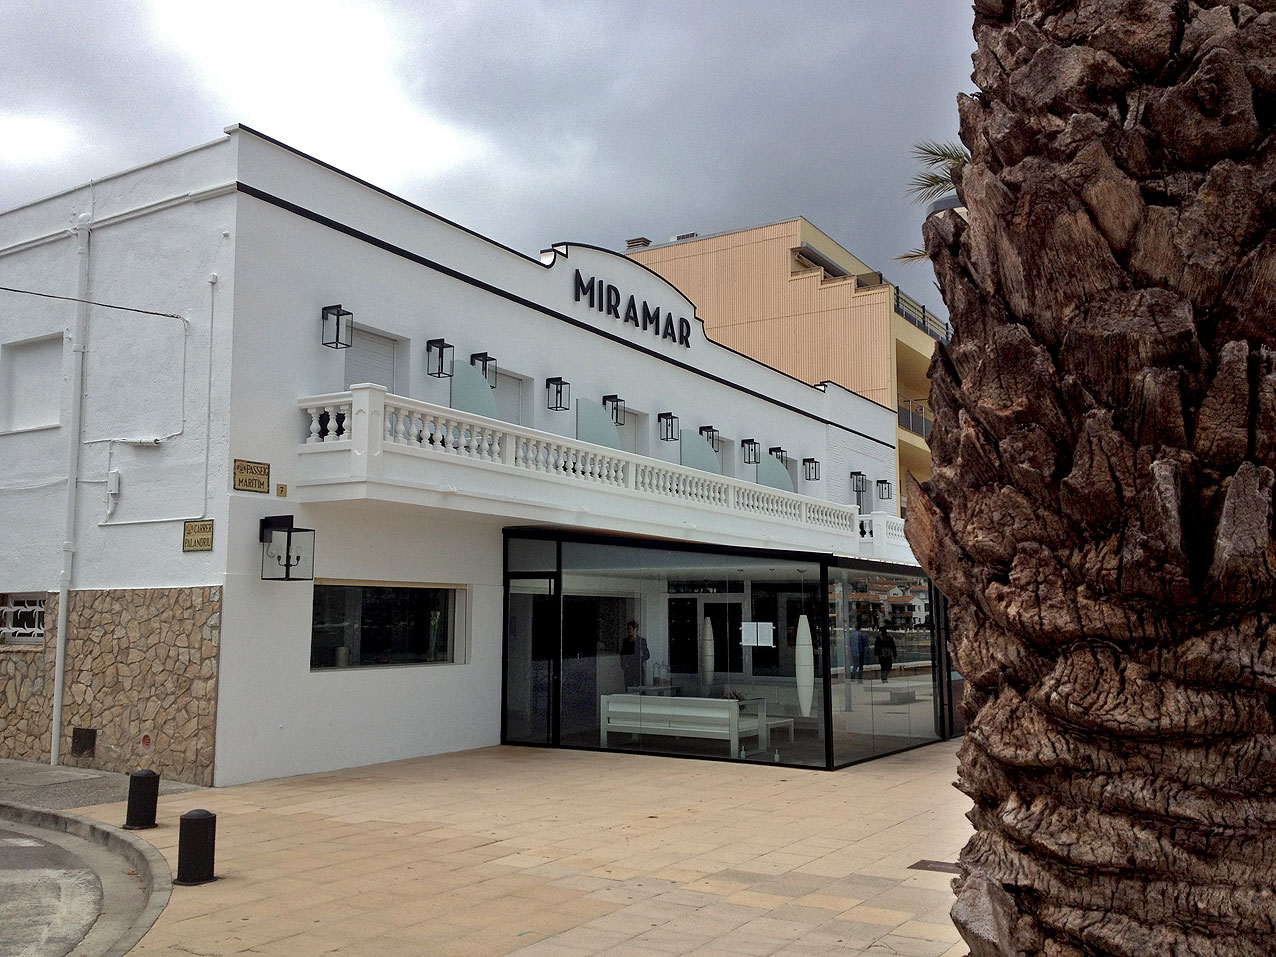 Restaurante Miramar (Girona)